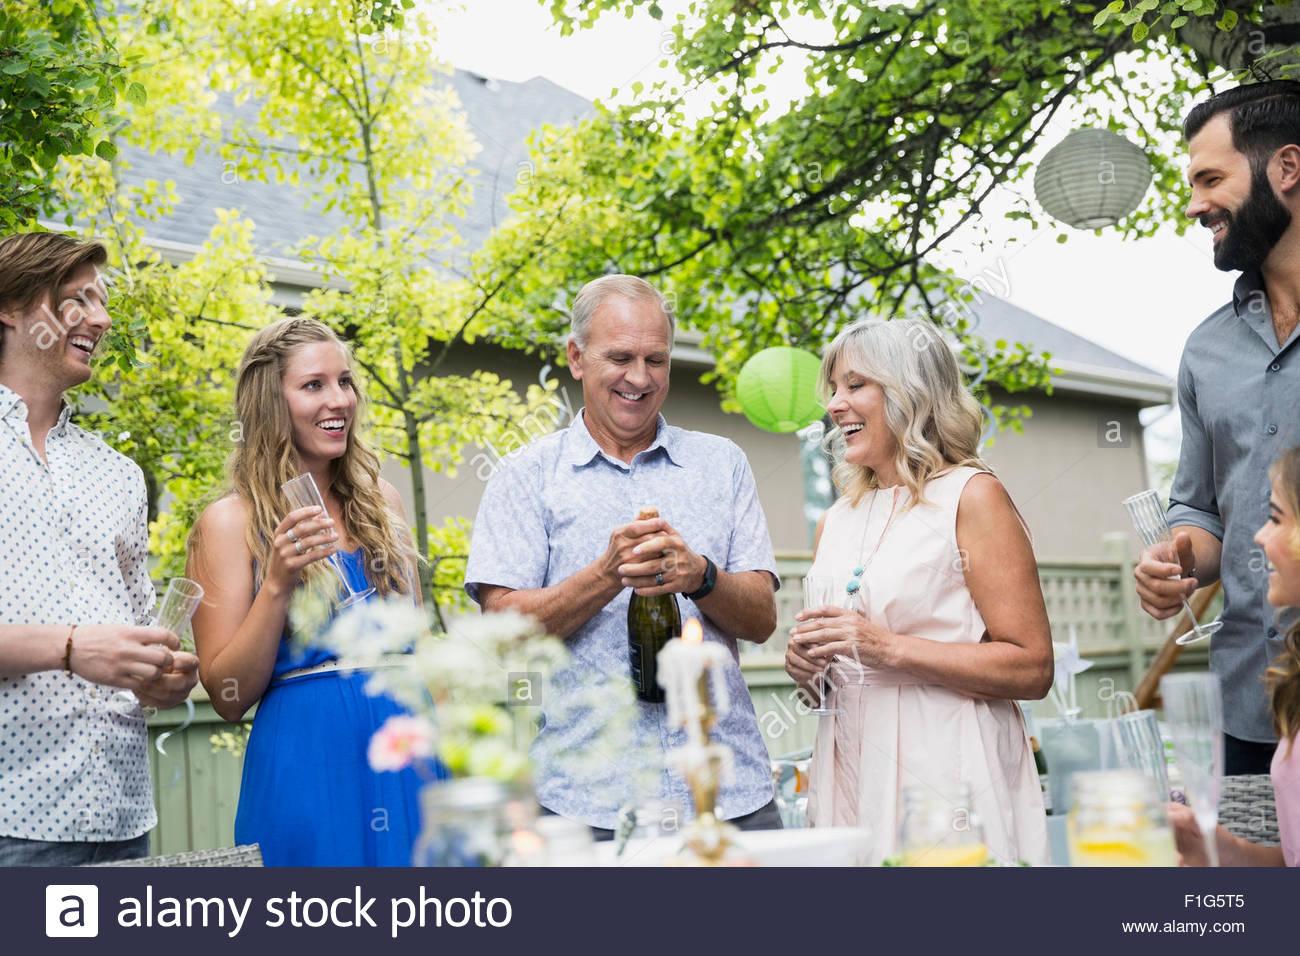 Mann öffnet Sektflasche mittags Gartenparty Stockbild